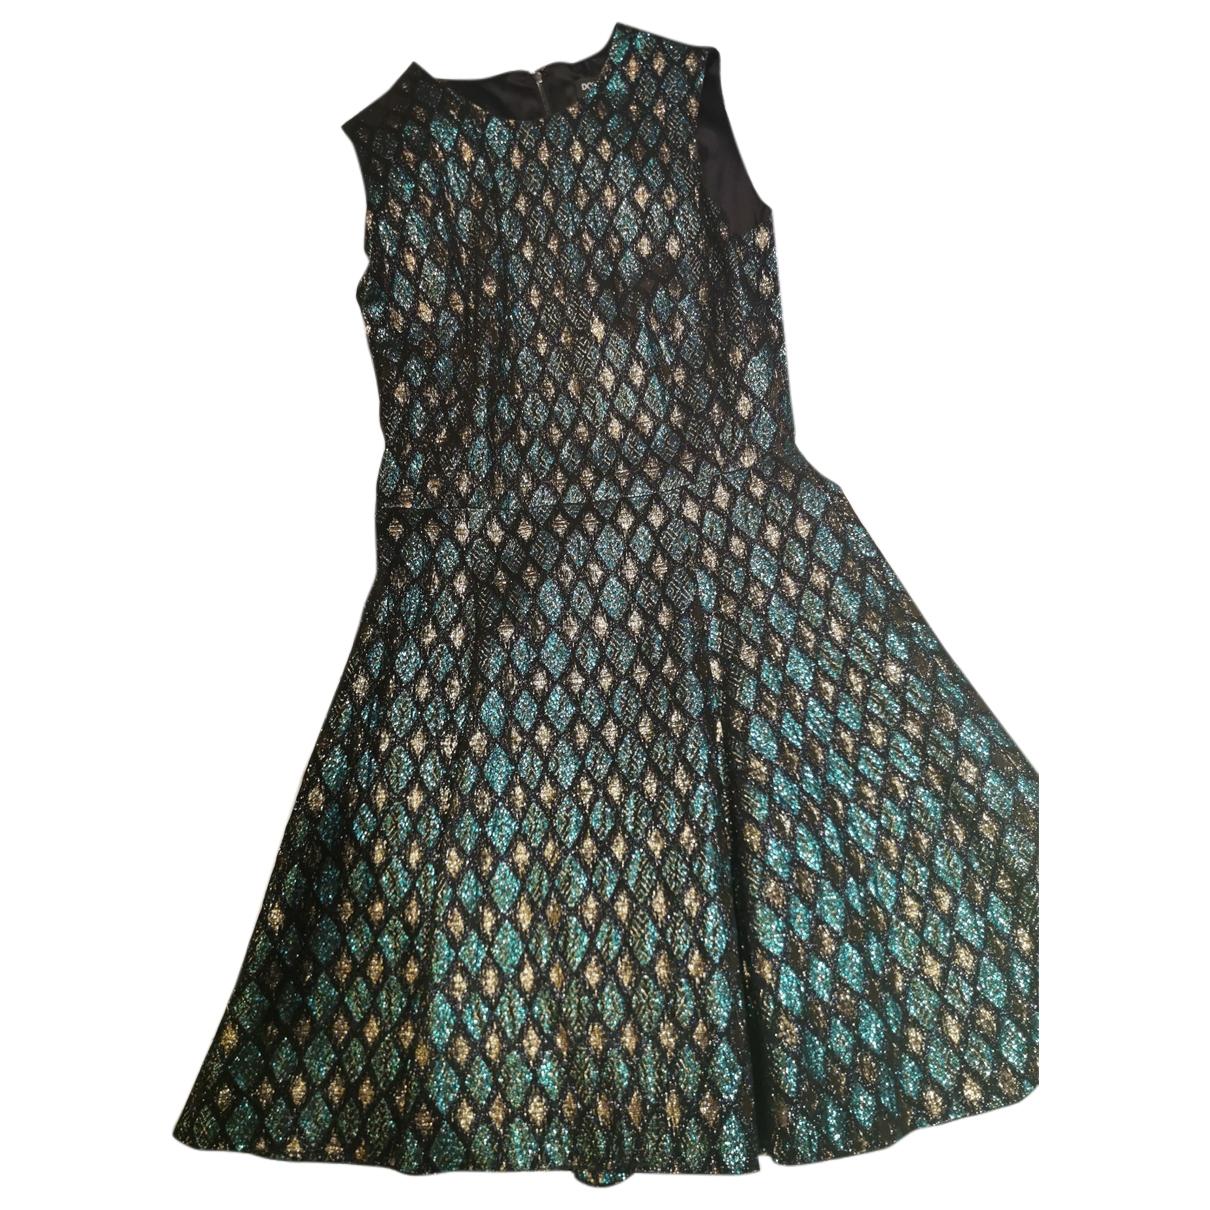 Dolce & Gabbana \N Gold dress for Women 40 IT